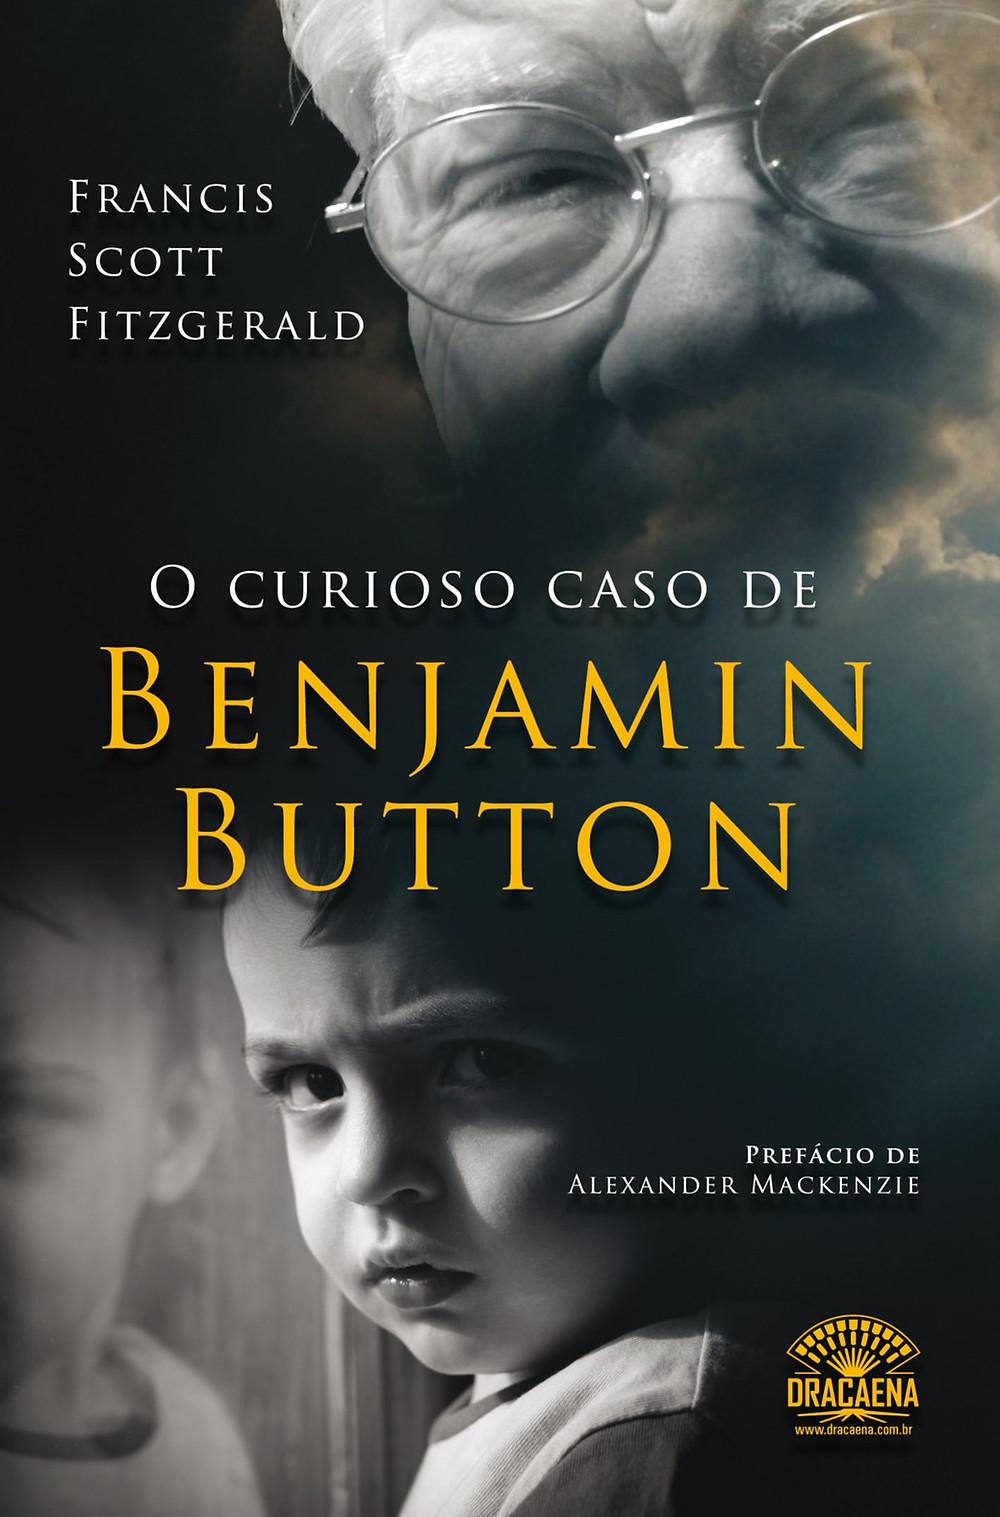 O Curioso Caso de Benjamin Button de F. Scott Fitzgerald